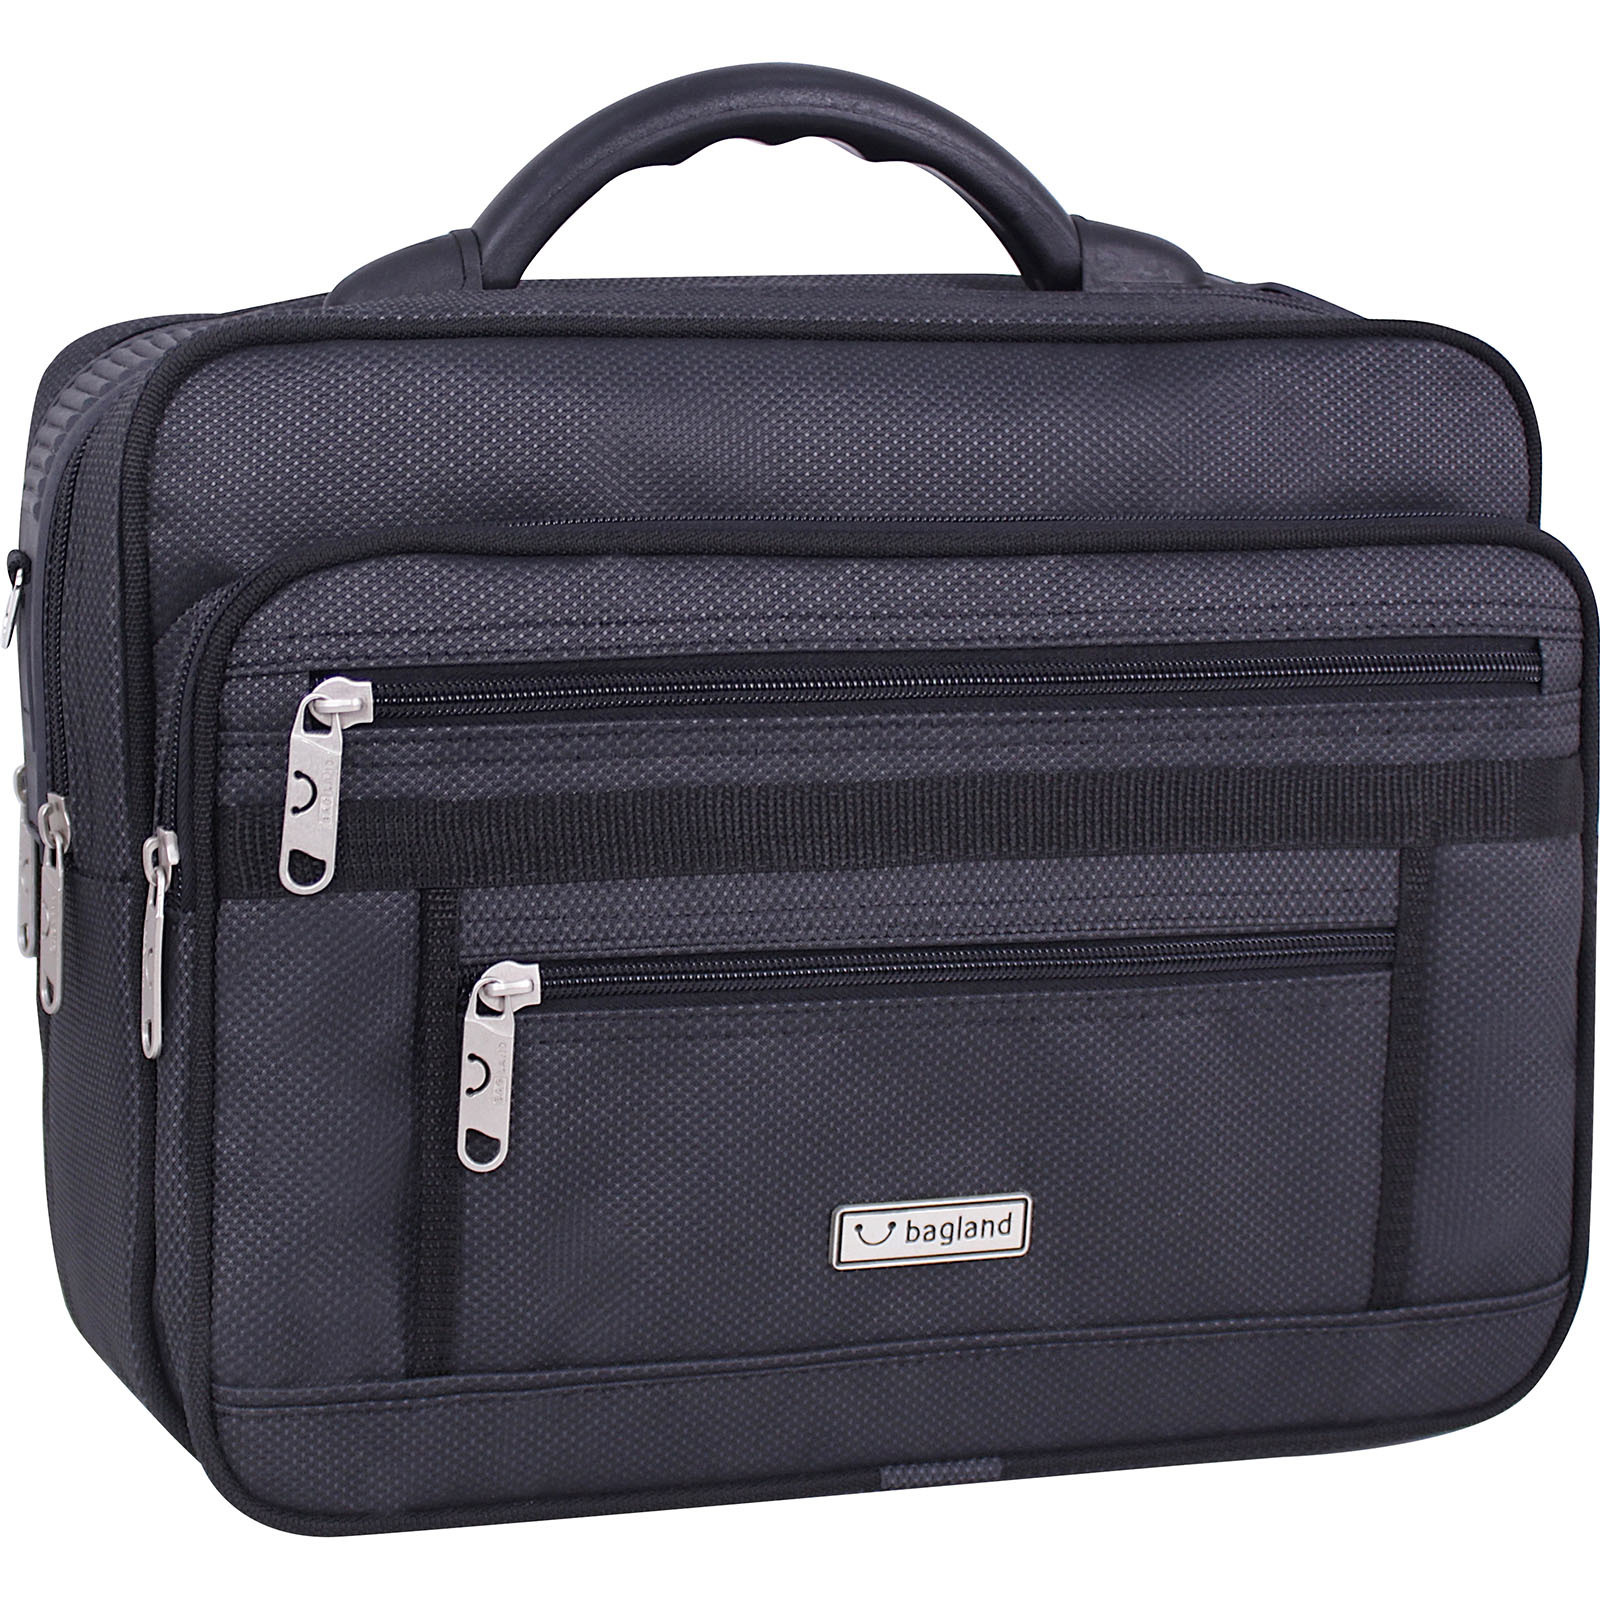 Сумки через плечо Мужская сумка Bagland Mr.Cool 15 л. Чёрный (00251169) IMG_9603.JPG